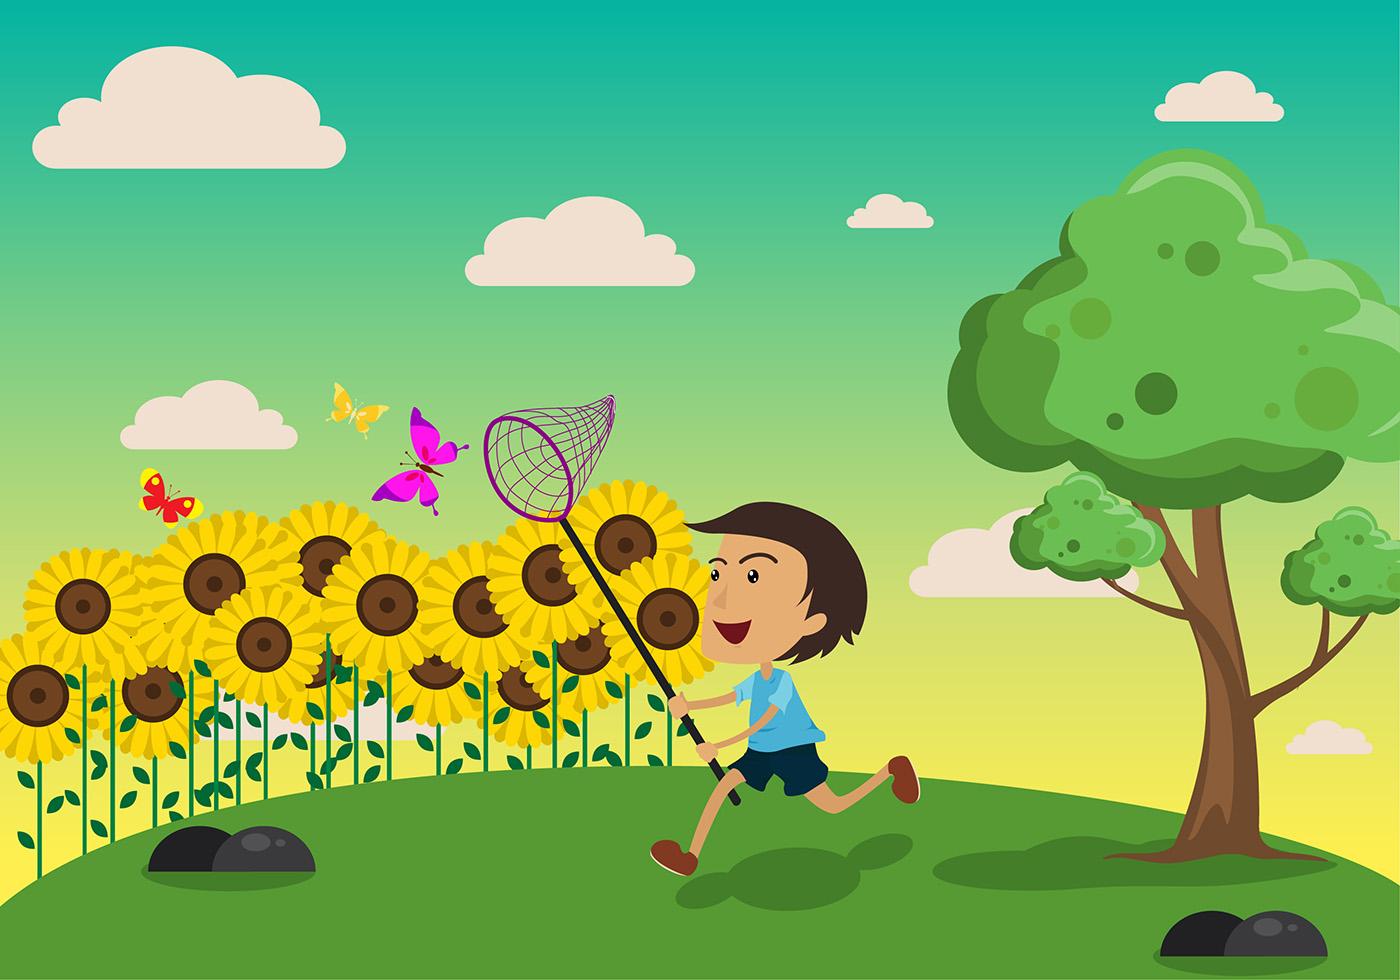 Butterfly net kids free vector download free vectors clipart graphics vector art - Children s day images download ...